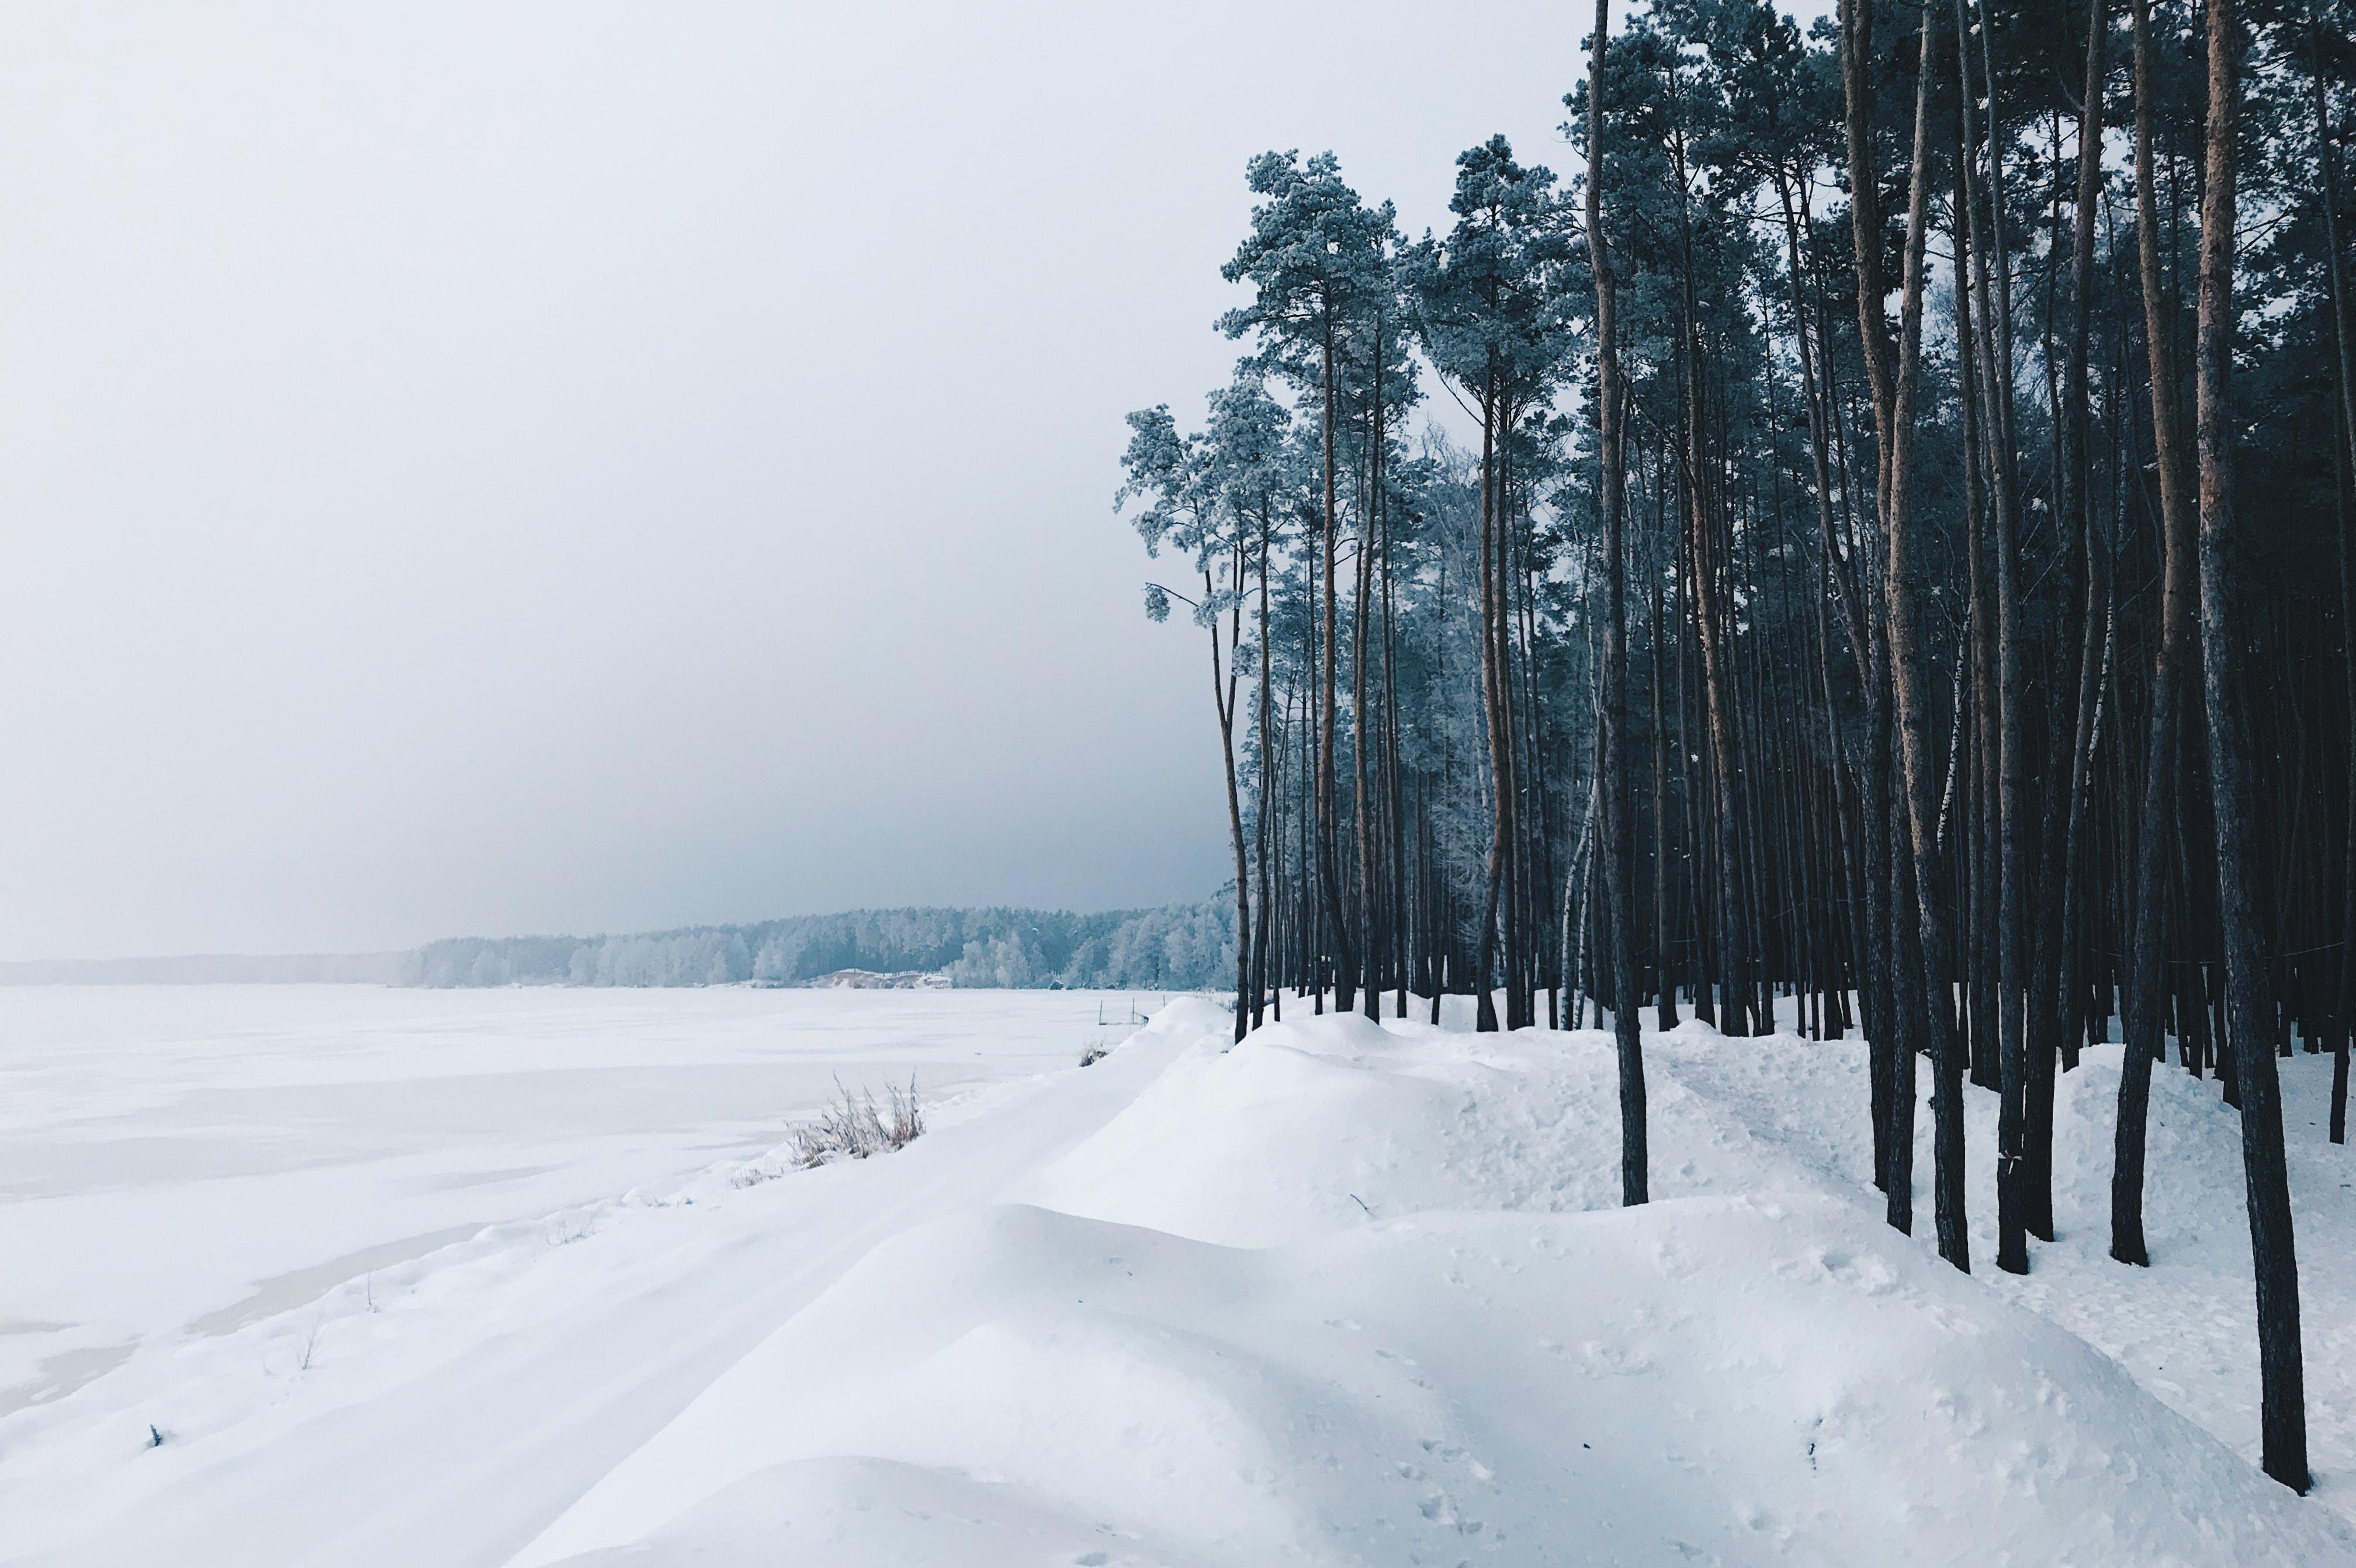 snowytrail during daytime